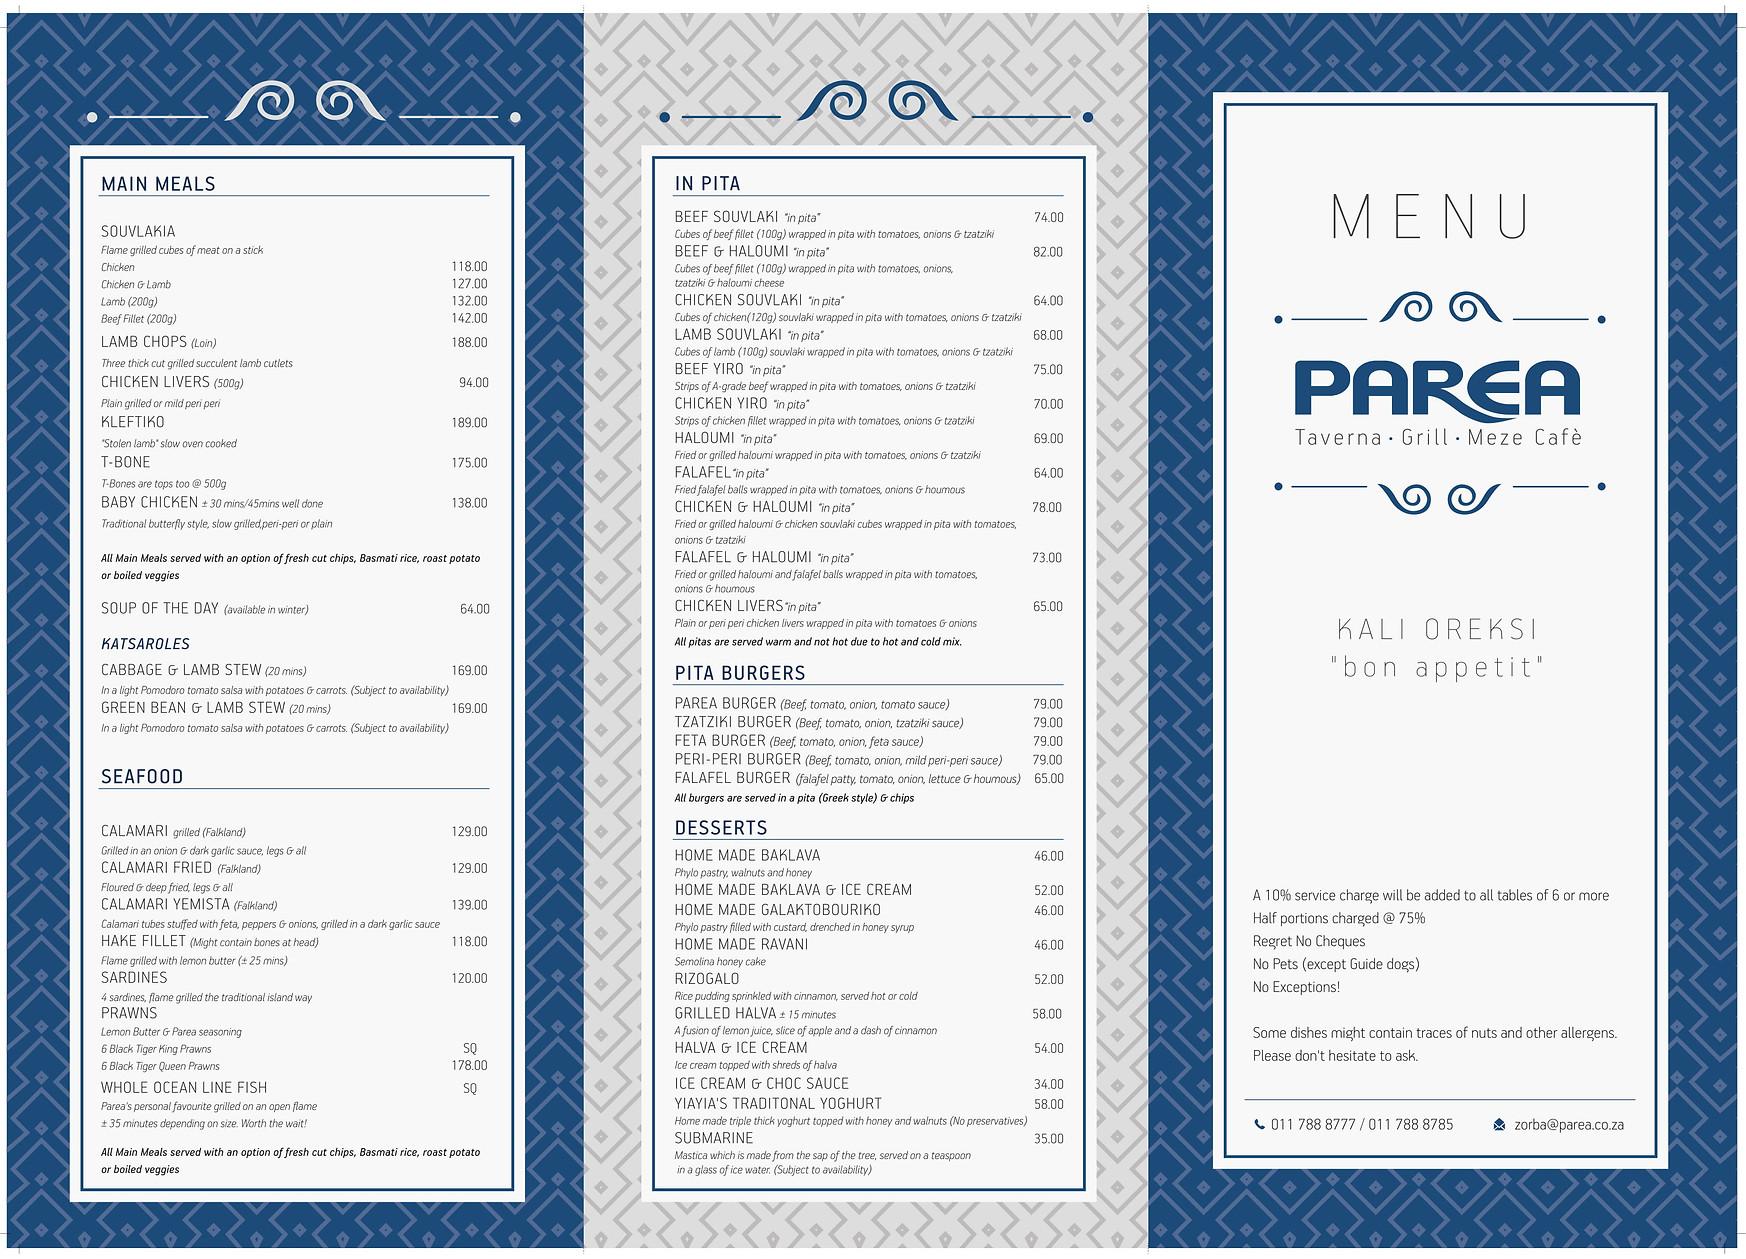 parea menu _2019 tel Print file-2.jpg